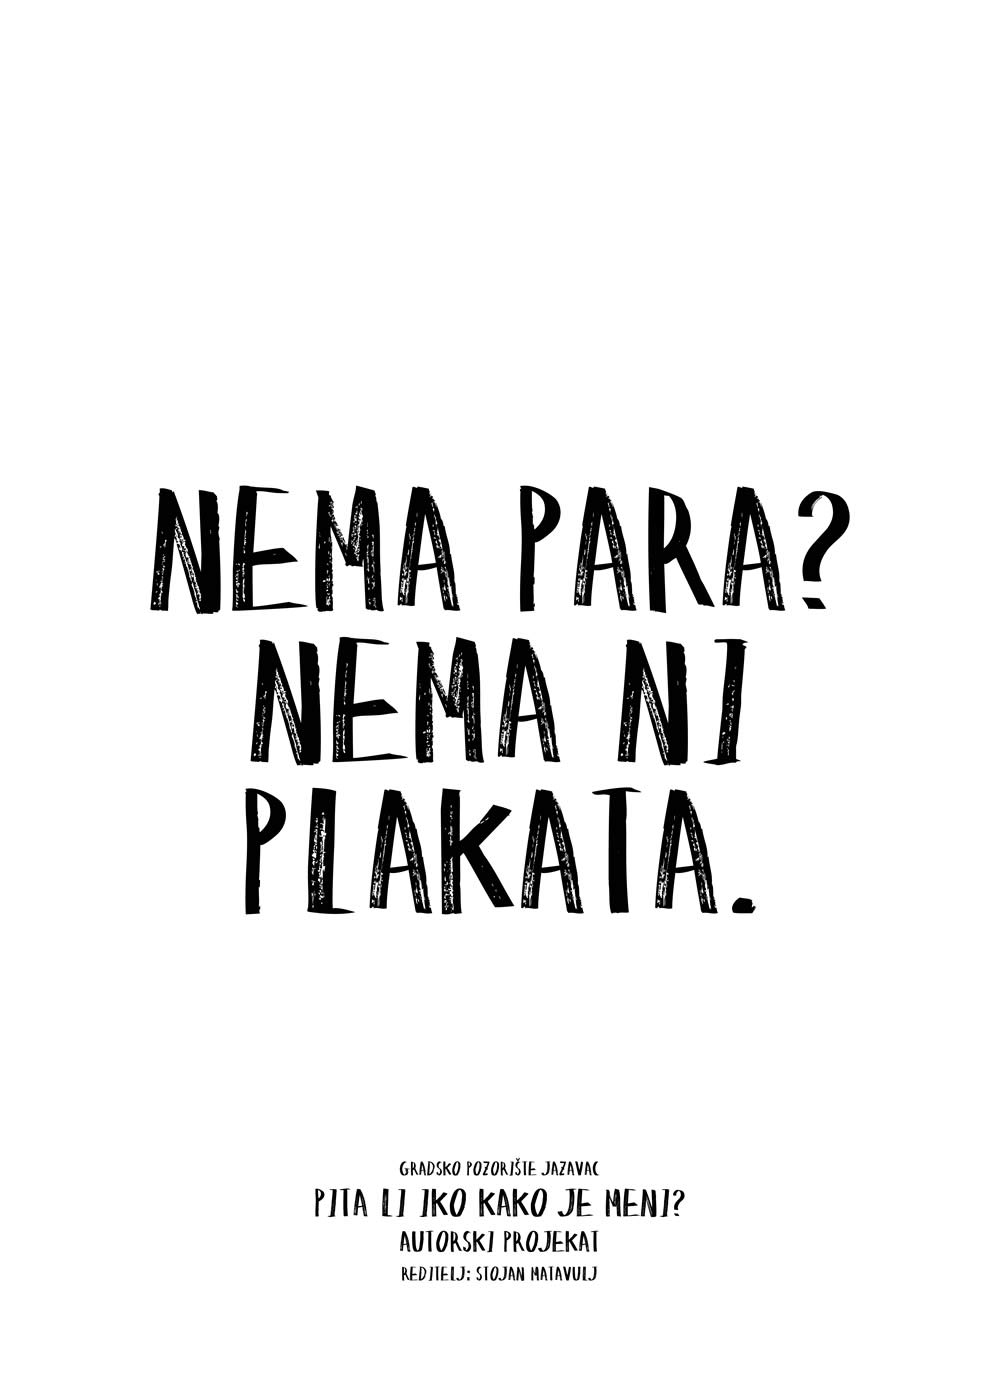 Jazavac-Pita-Preview-01-181